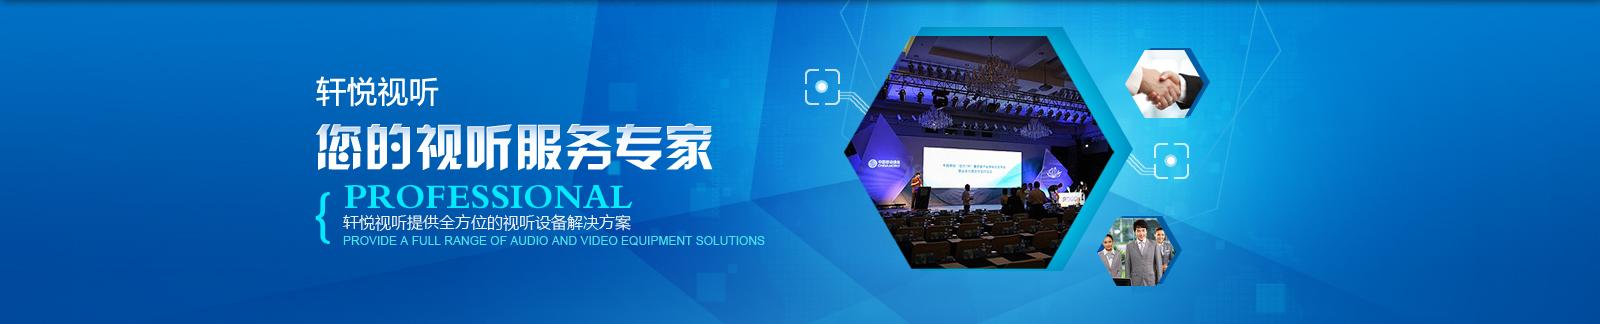 www.yzc88.cc_亚洲城提供北京同声传译、广州同传设备